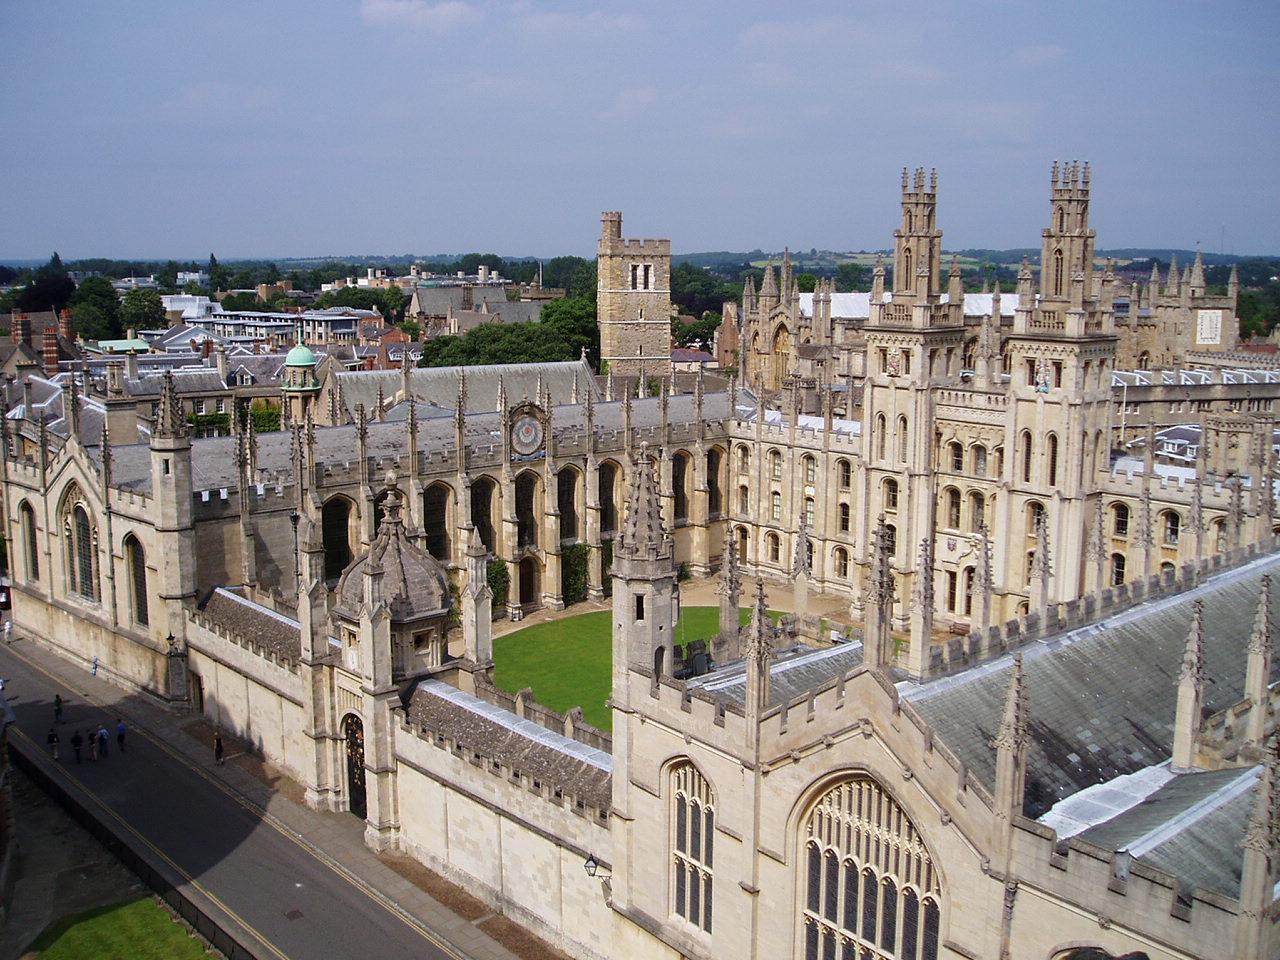 St. Antony's College at Oxford University, Oxford.